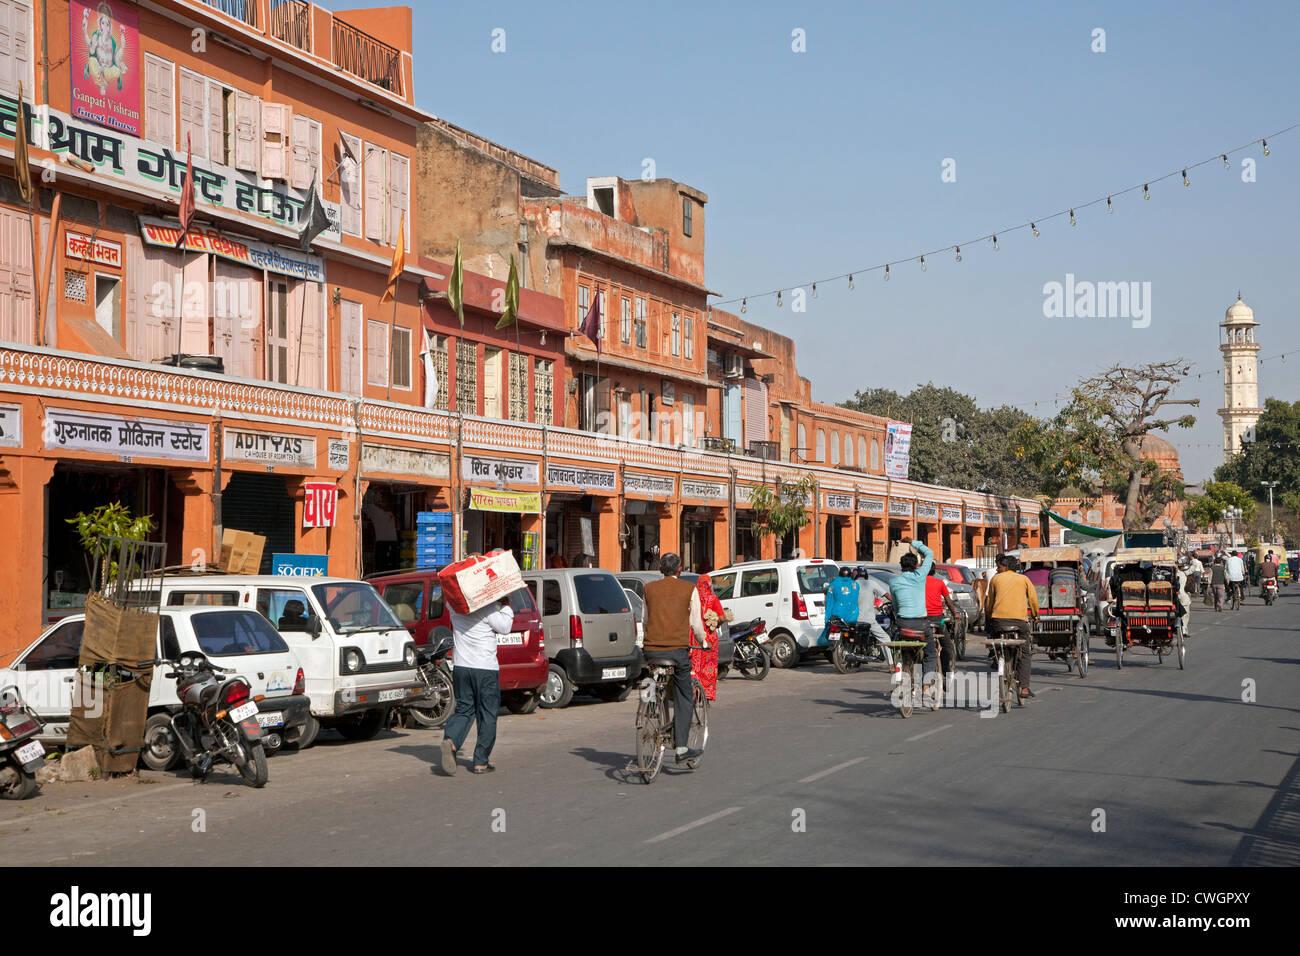 Scena di strada nella città rosa di Jaipur, Rajasthan, India Immagini Stock